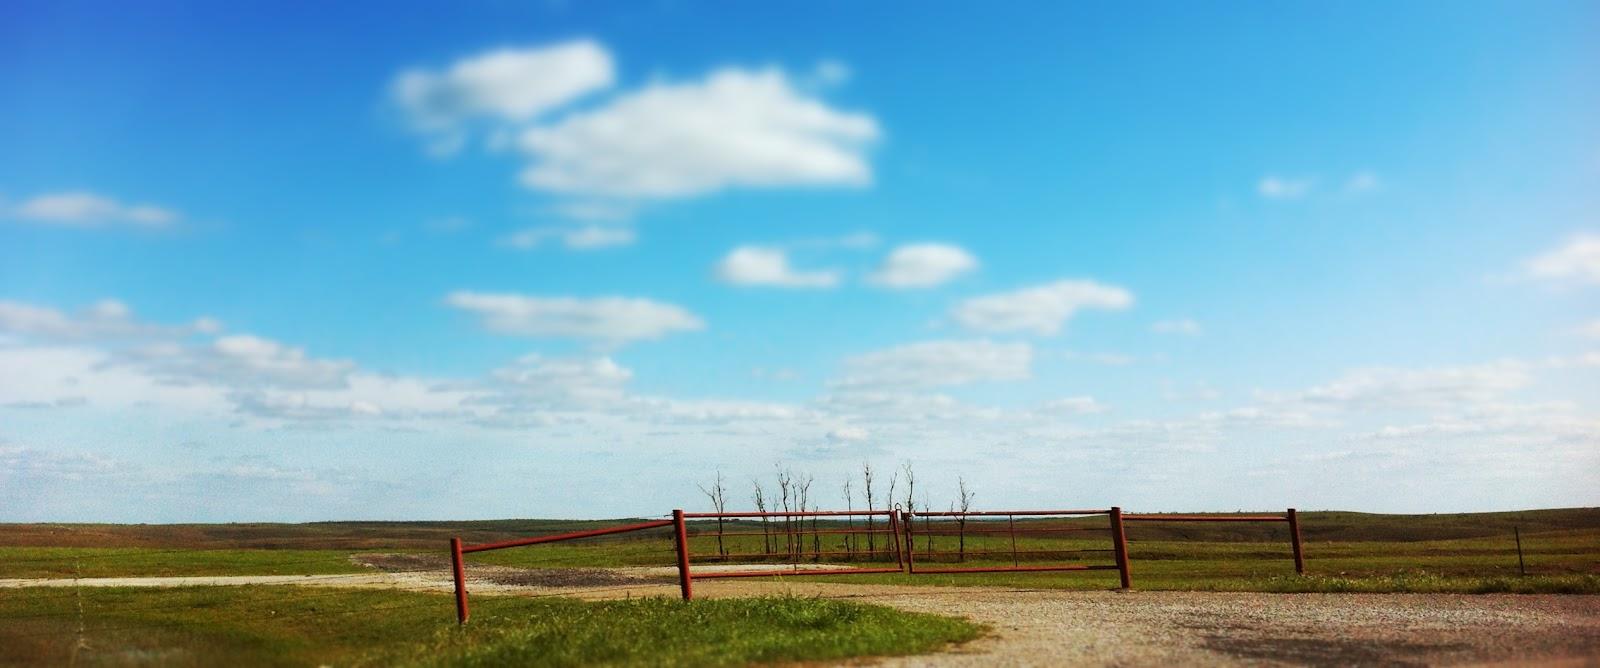 Sun Prairie Used Cars